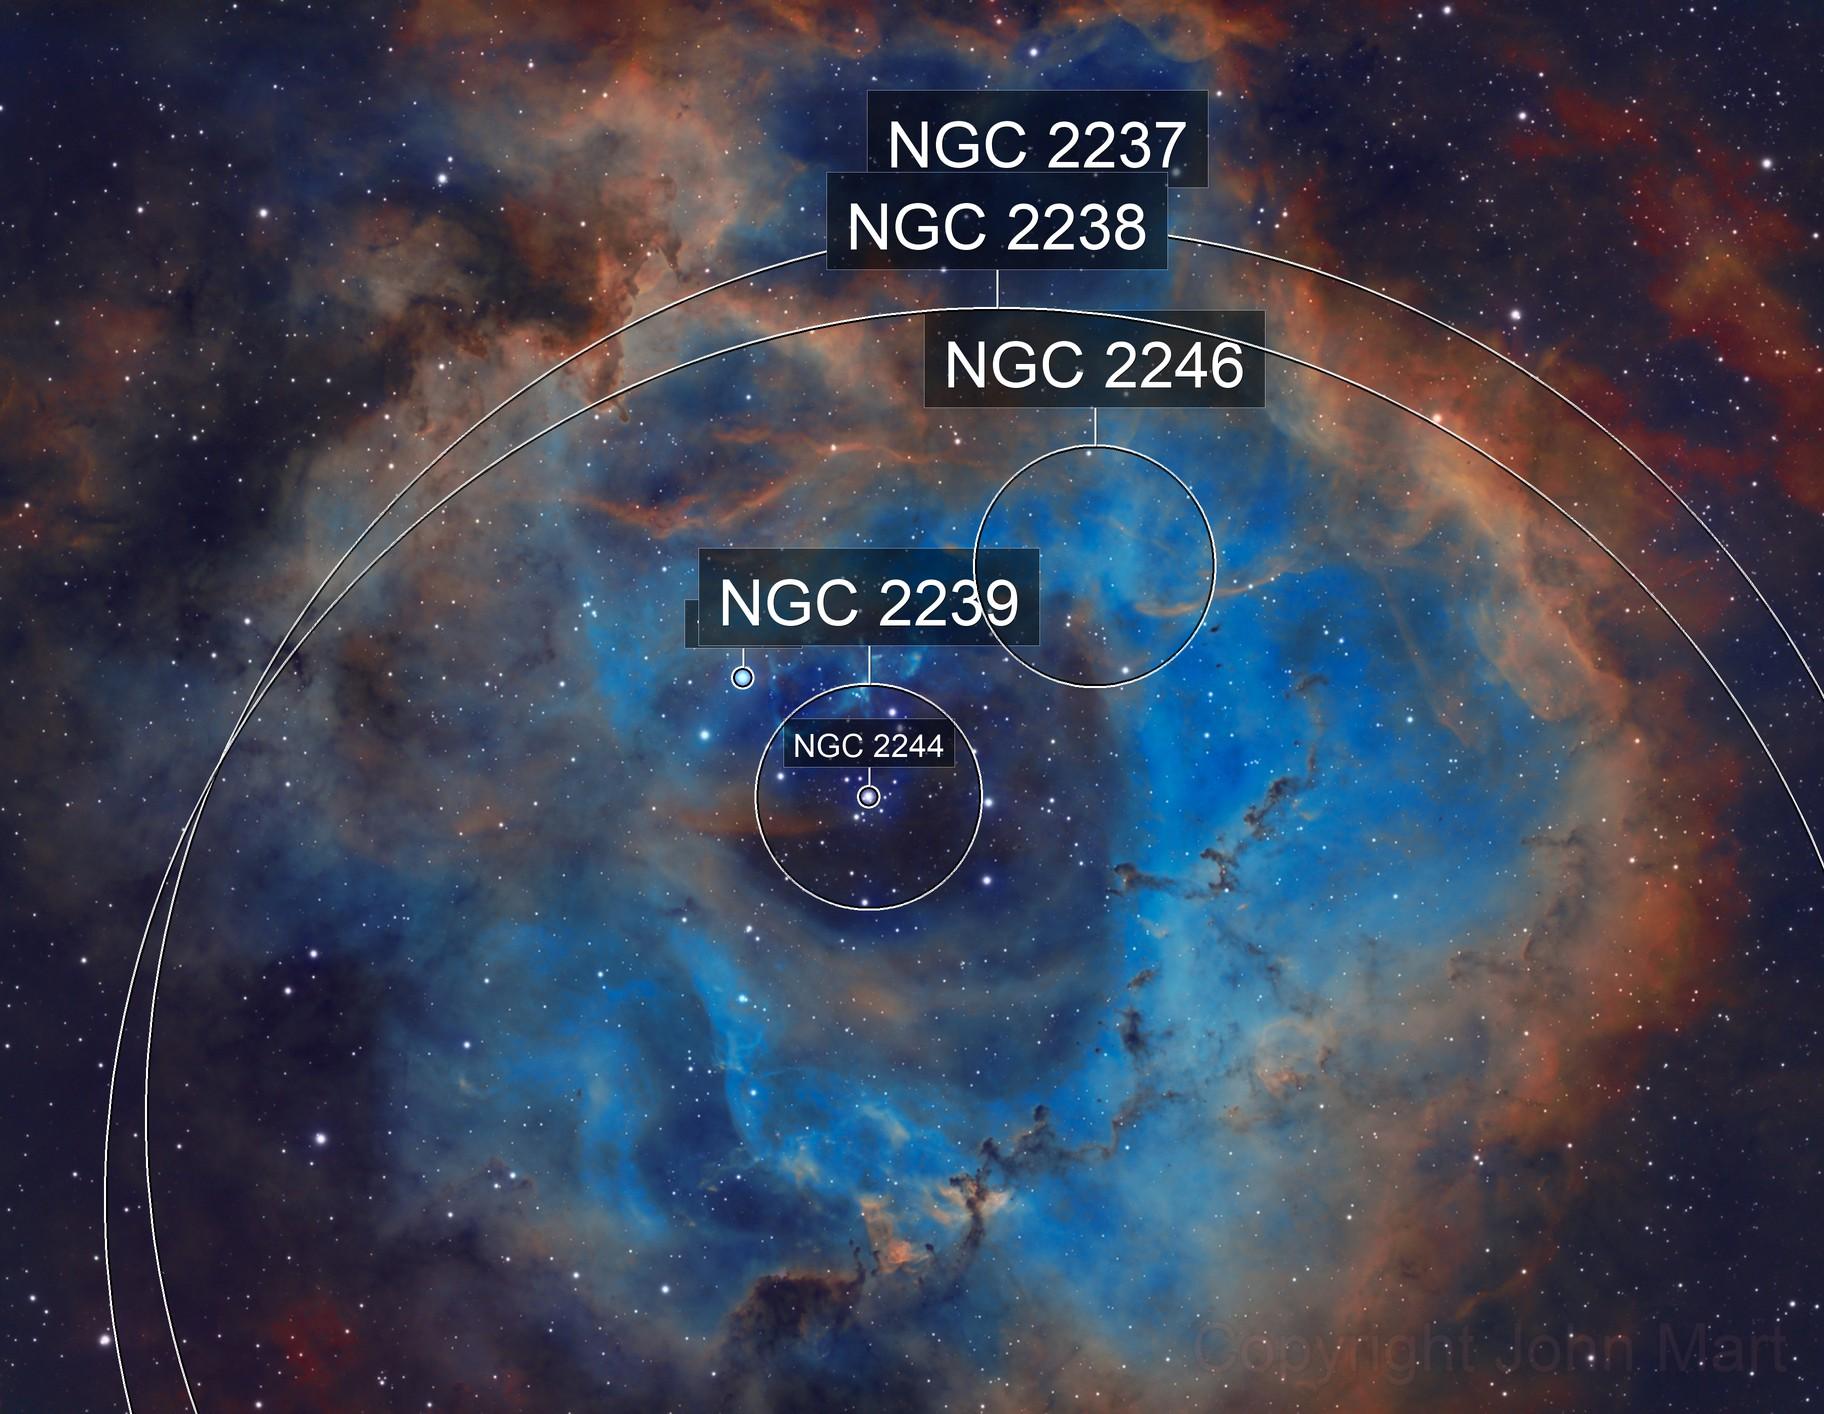 ngc2244 in LSHO